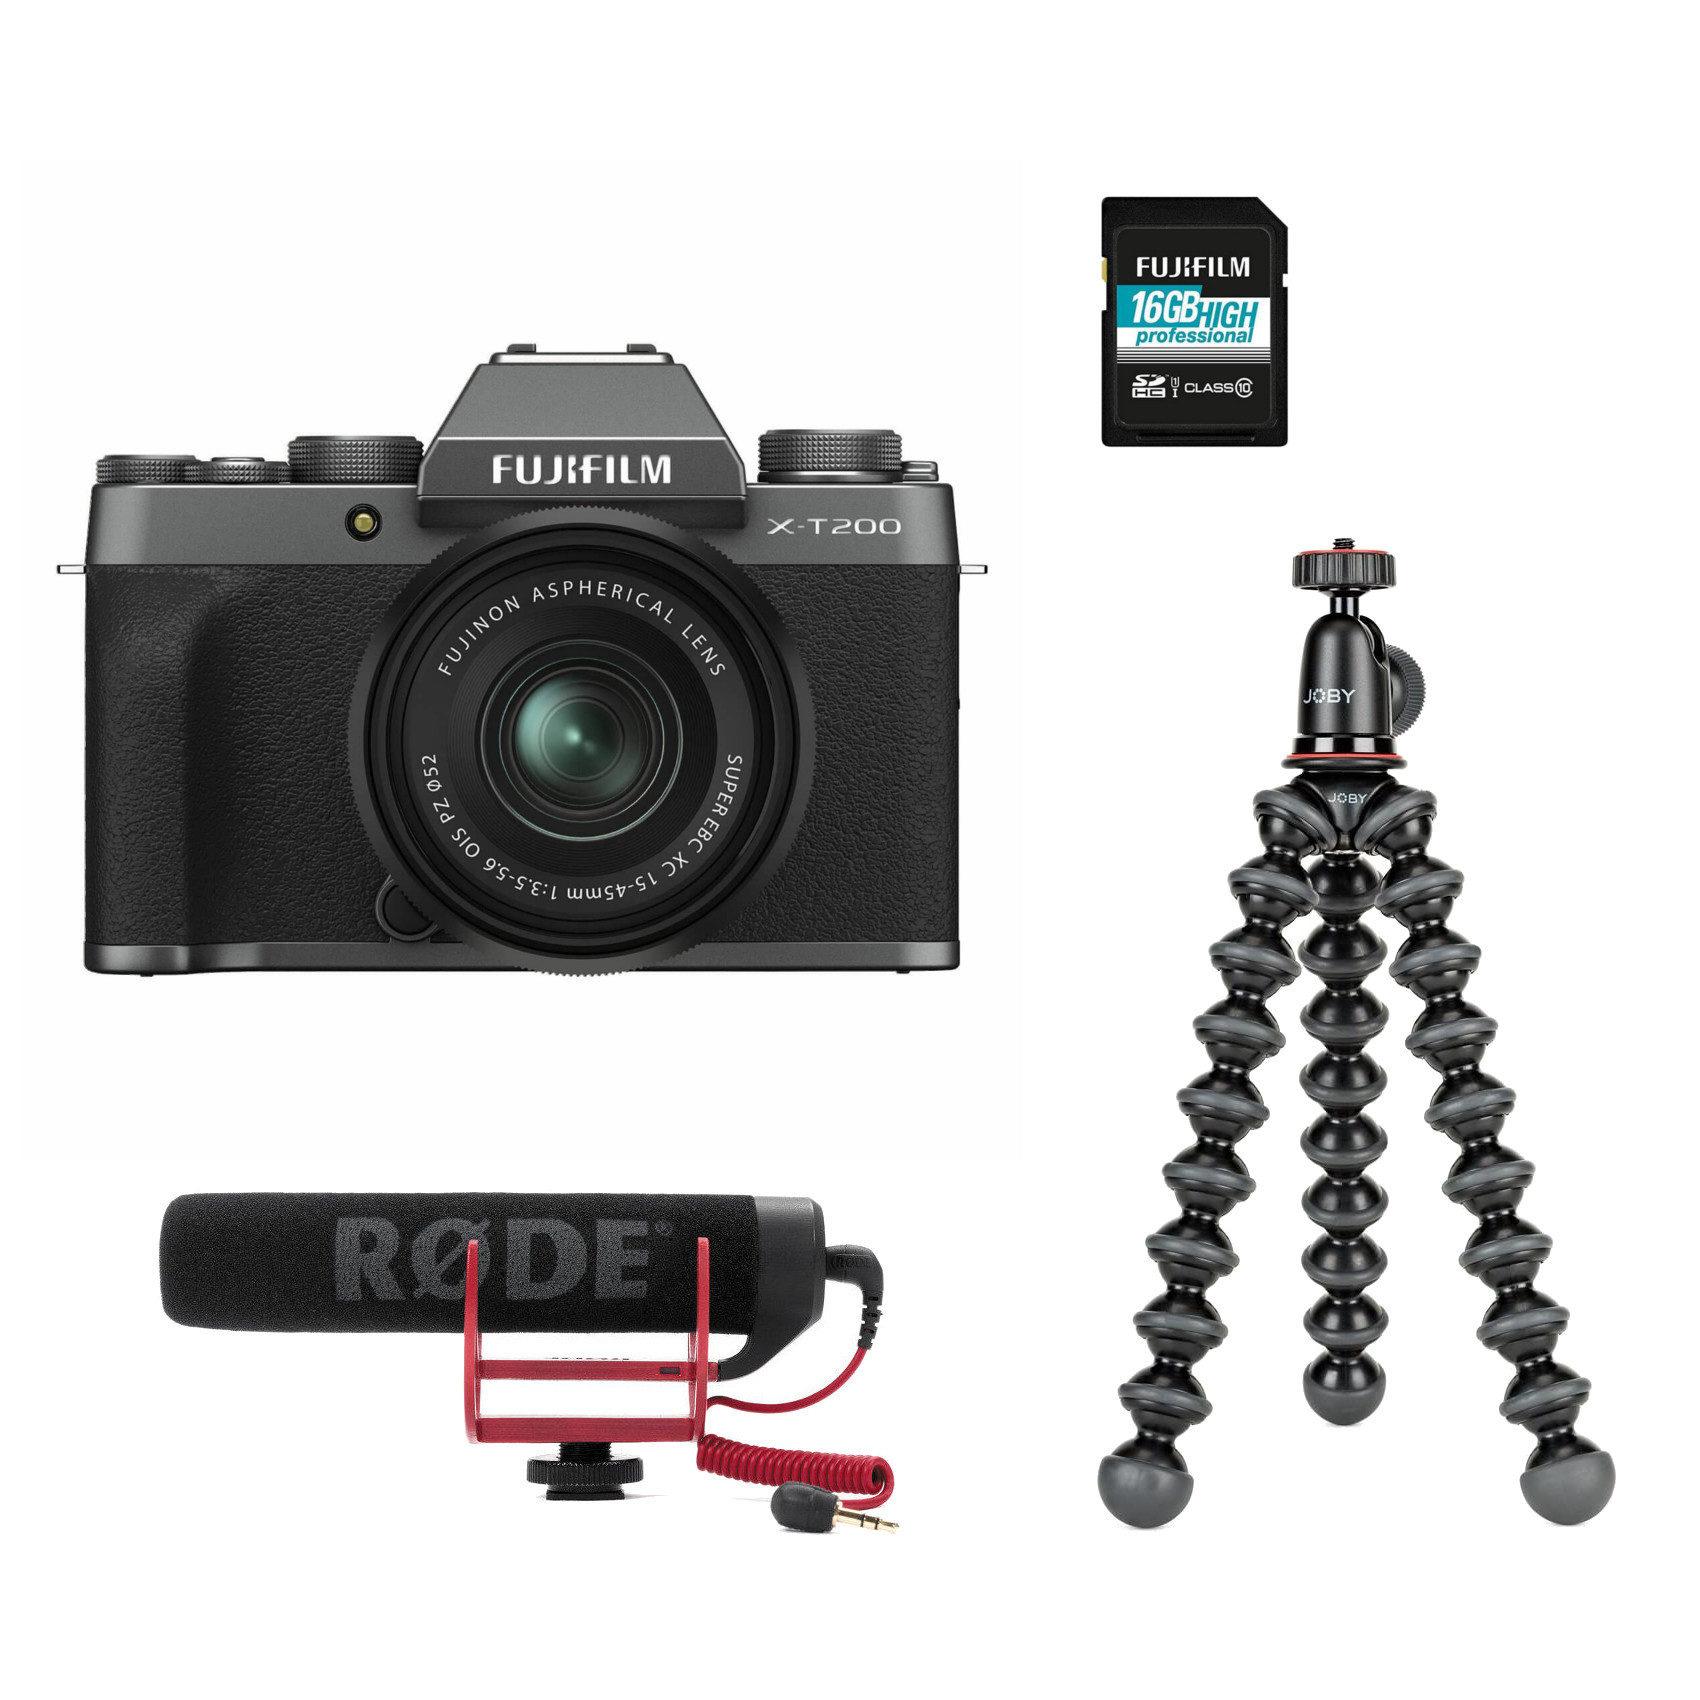 Fujifilm X-T200 systeemcamera Donker Zilver + XC 15-45mm Vlogger Kit <br/>€ 899.00 <br/> <a href='https://www.cameranu.nl/fotografie/?tt=12190_474631_241358_&r=https%3A%2F%2Fwww.cameranu.nl%2Fnl%2Fp3174067%2Ffujifilm-x-t200-systeemcamera-donker-zilver-xc-15-45mm-vlogger-kit%3Fchannable%3De10841.MzE3NDA2Nw%26utm_campaign%3D%26utm_content%3DSysteemcamera%26utm_source%3DTradetracker%26utm_medium%3Dcpc%26utm_term%3DDigitale%2Bcamera%26apos%3Bs' target='_blank'>naar de winkel</a>